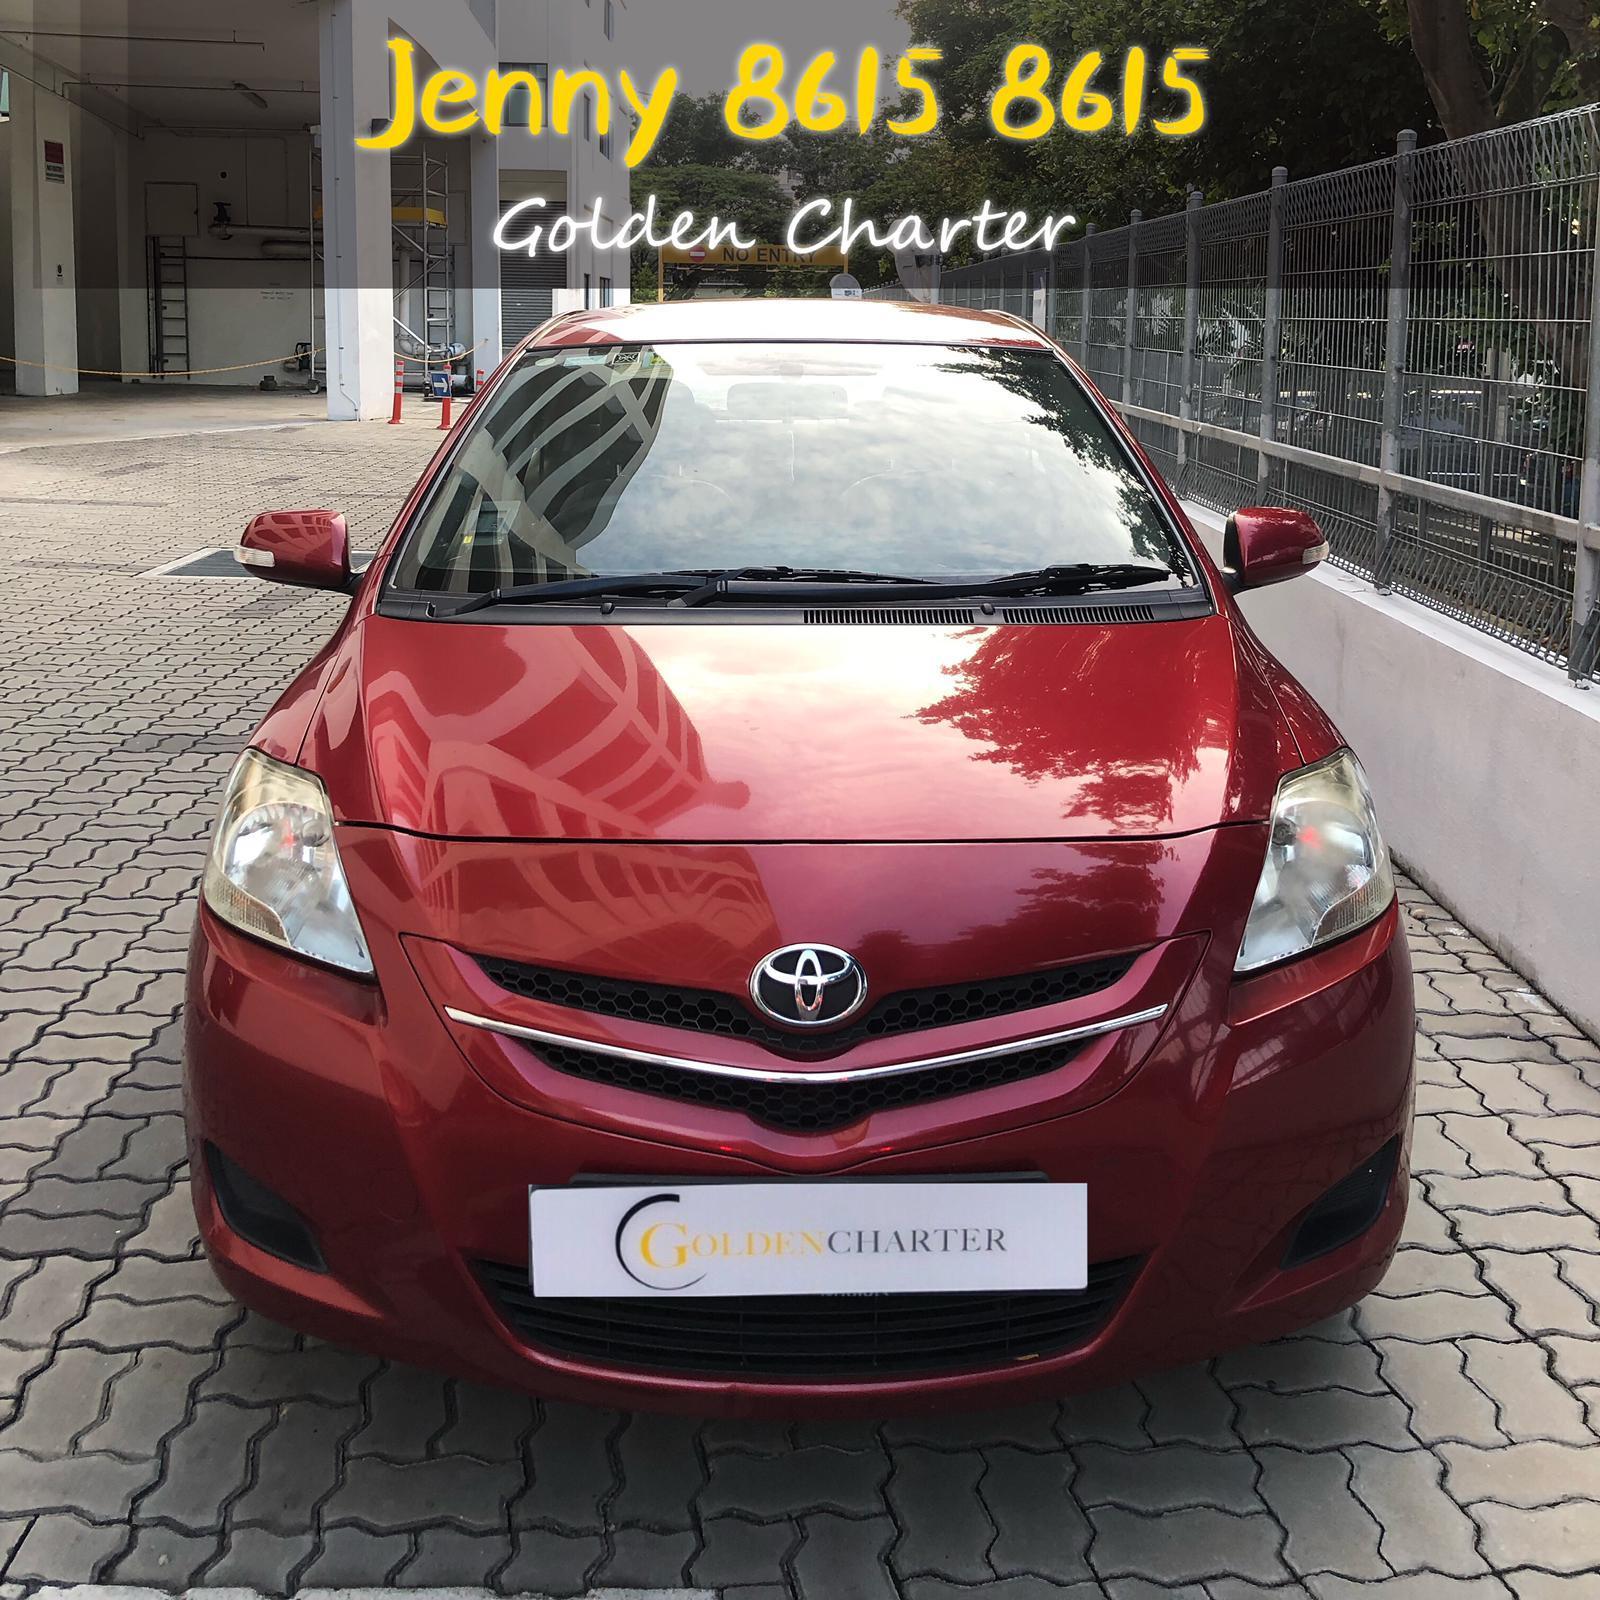 *$190 After Gojek rebate Toyota Vios 1.6a Altis Car Axio Premio Allion Camry Honda Jazz Fit Stream Civic Cars Hyundai Avante $50 perday PHV  For Rent Grab Rental Gojek Or Personal Use Low price and Cheap